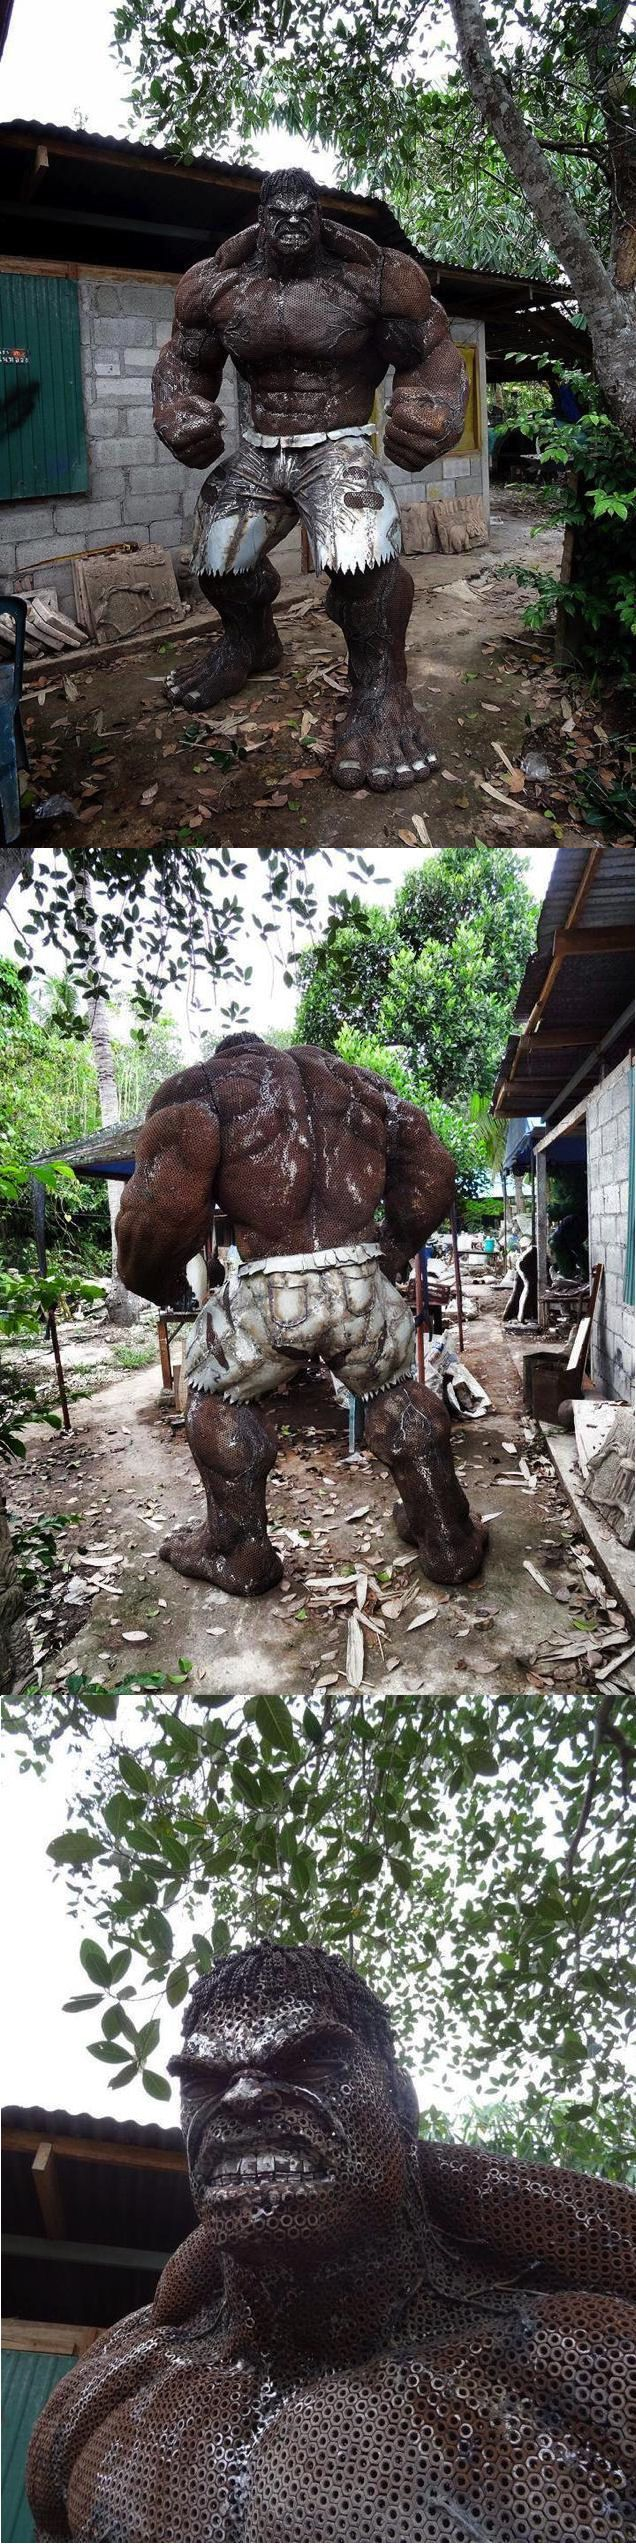 Hulk de métal